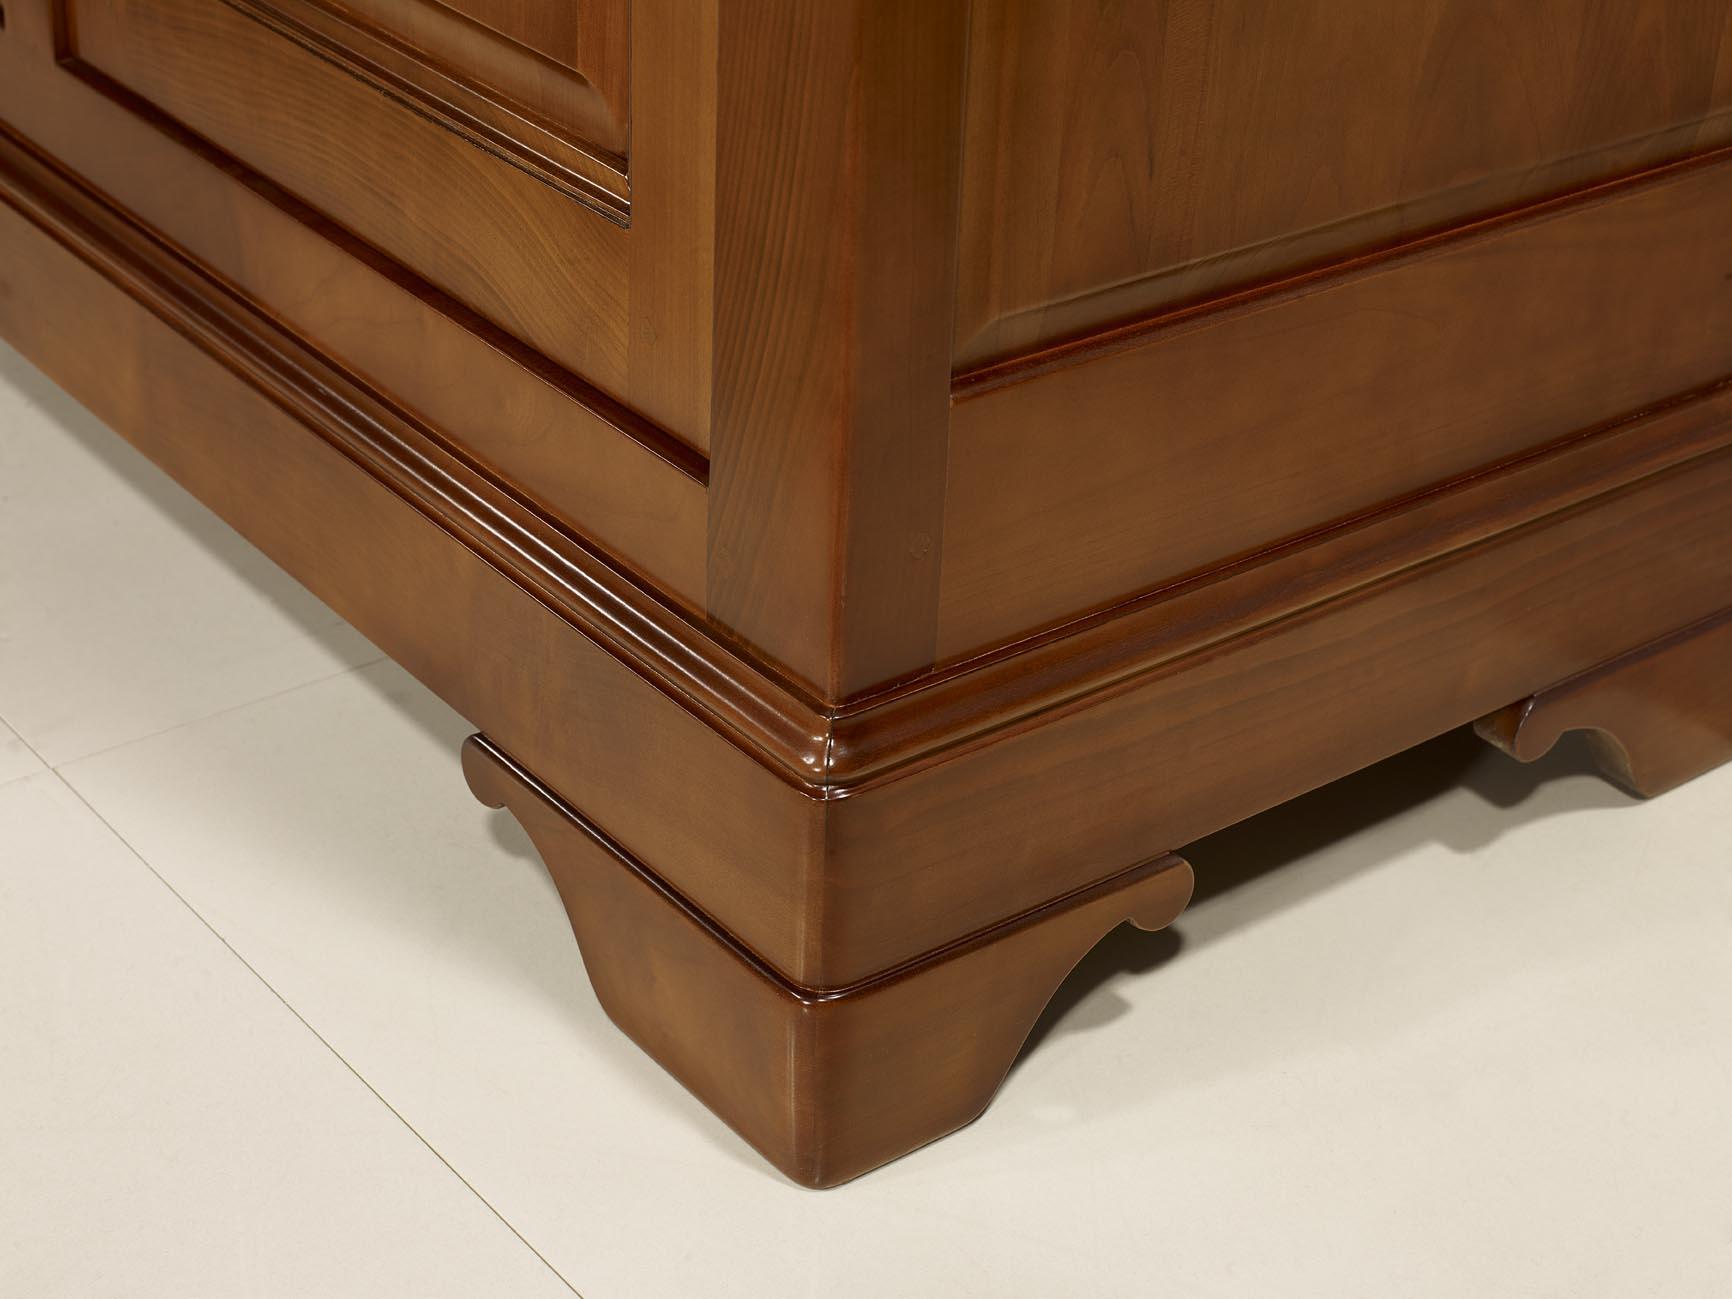 buffet 4 portes en merisier massif de style louis philippe meuble en merisier massif. Black Bedroom Furniture Sets. Home Design Ideas